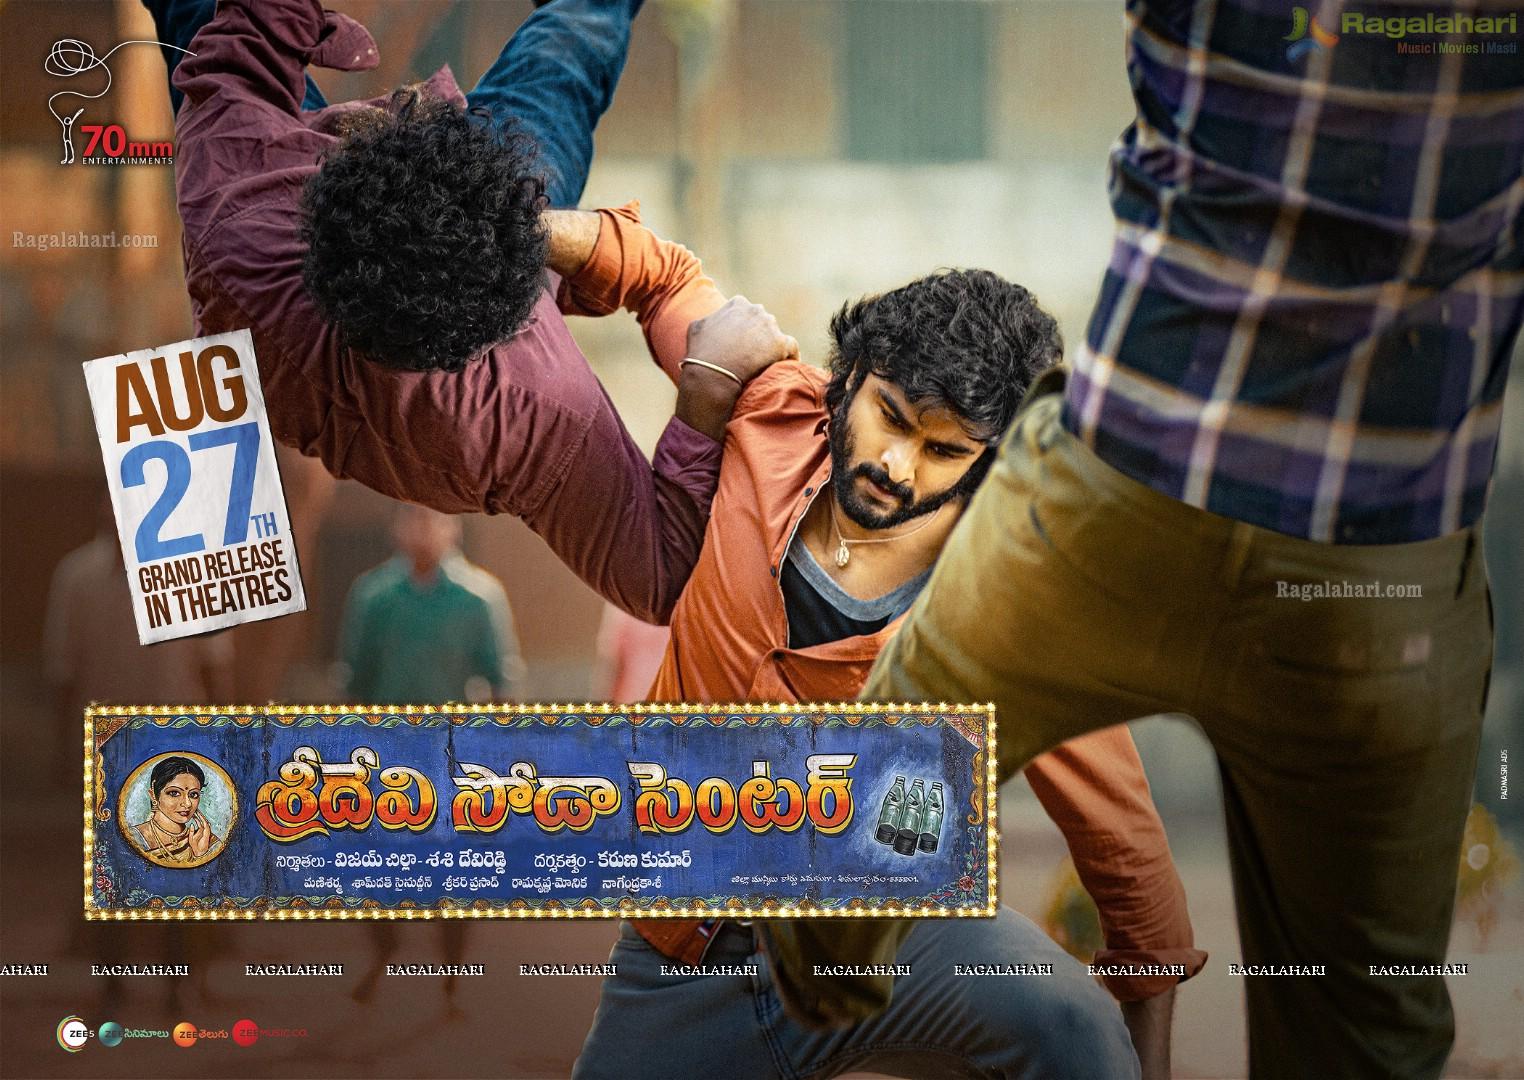 Sridevi Soda Center Movie Poster Design 14